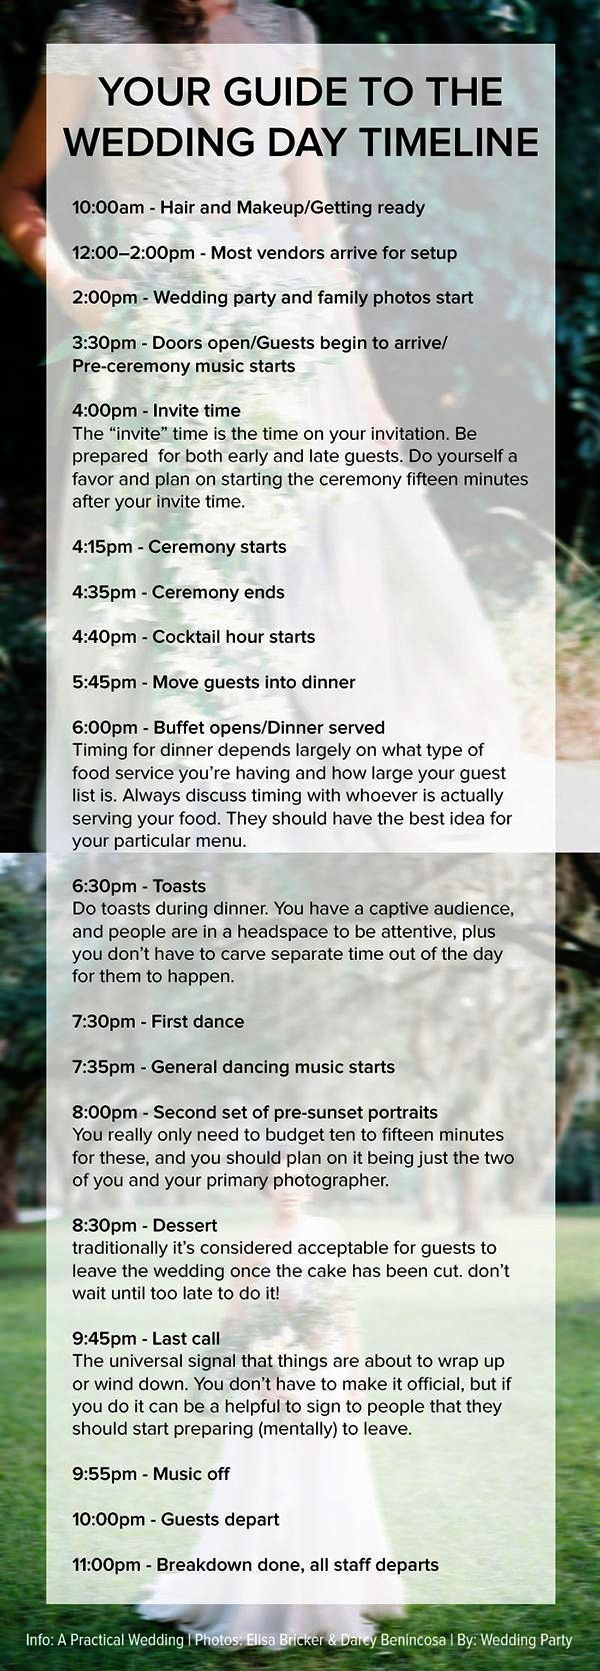 Unique Wedding Entertainment Ideas Uk Wedding Ideas Nyc Wedding Day Timeline Evening Wedding Ceremony Wedding Planning Timeline